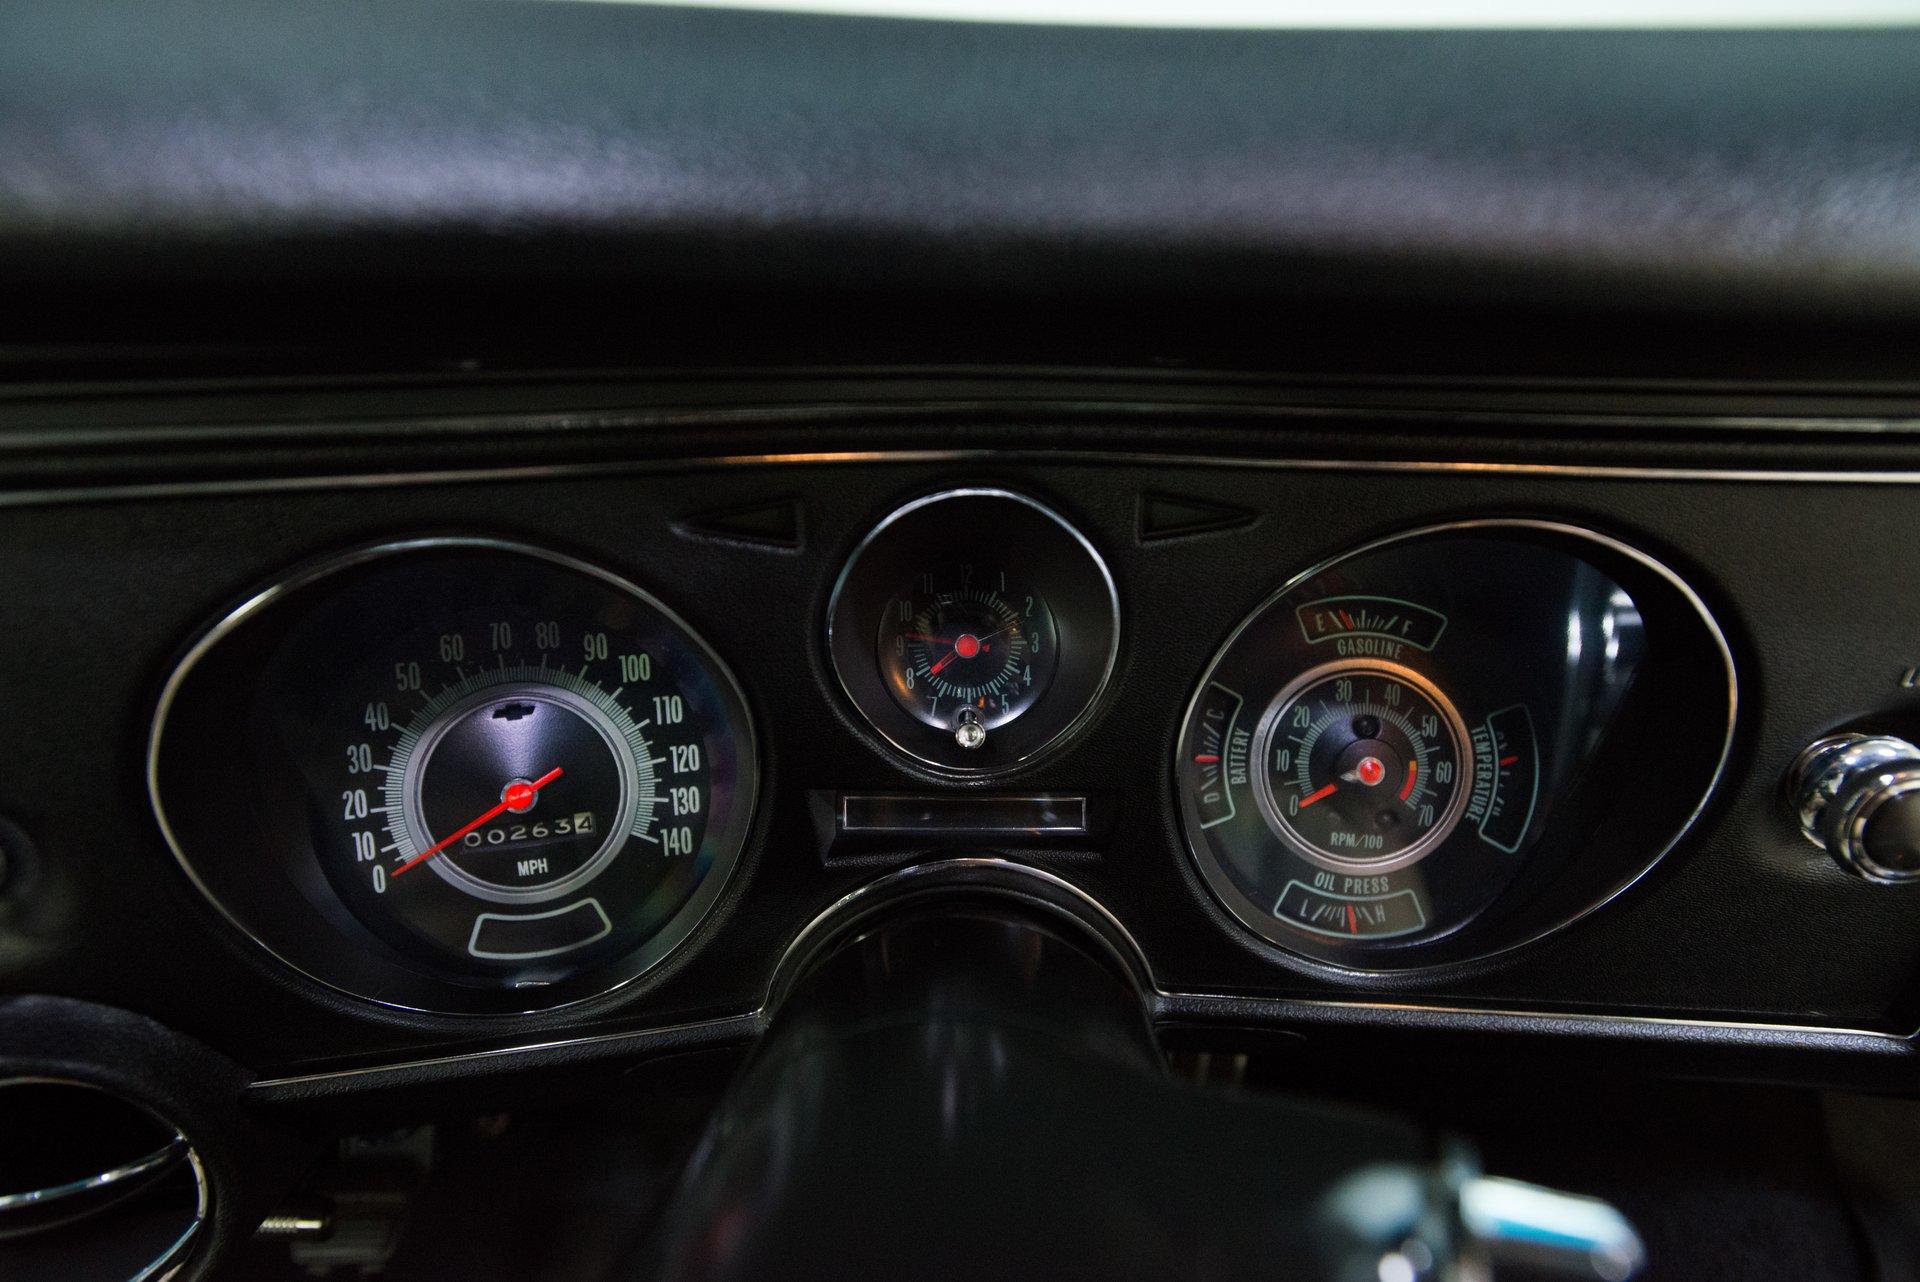 134834 1969 Chevrolet Chevelle RK Motors Classic Cars for Sale